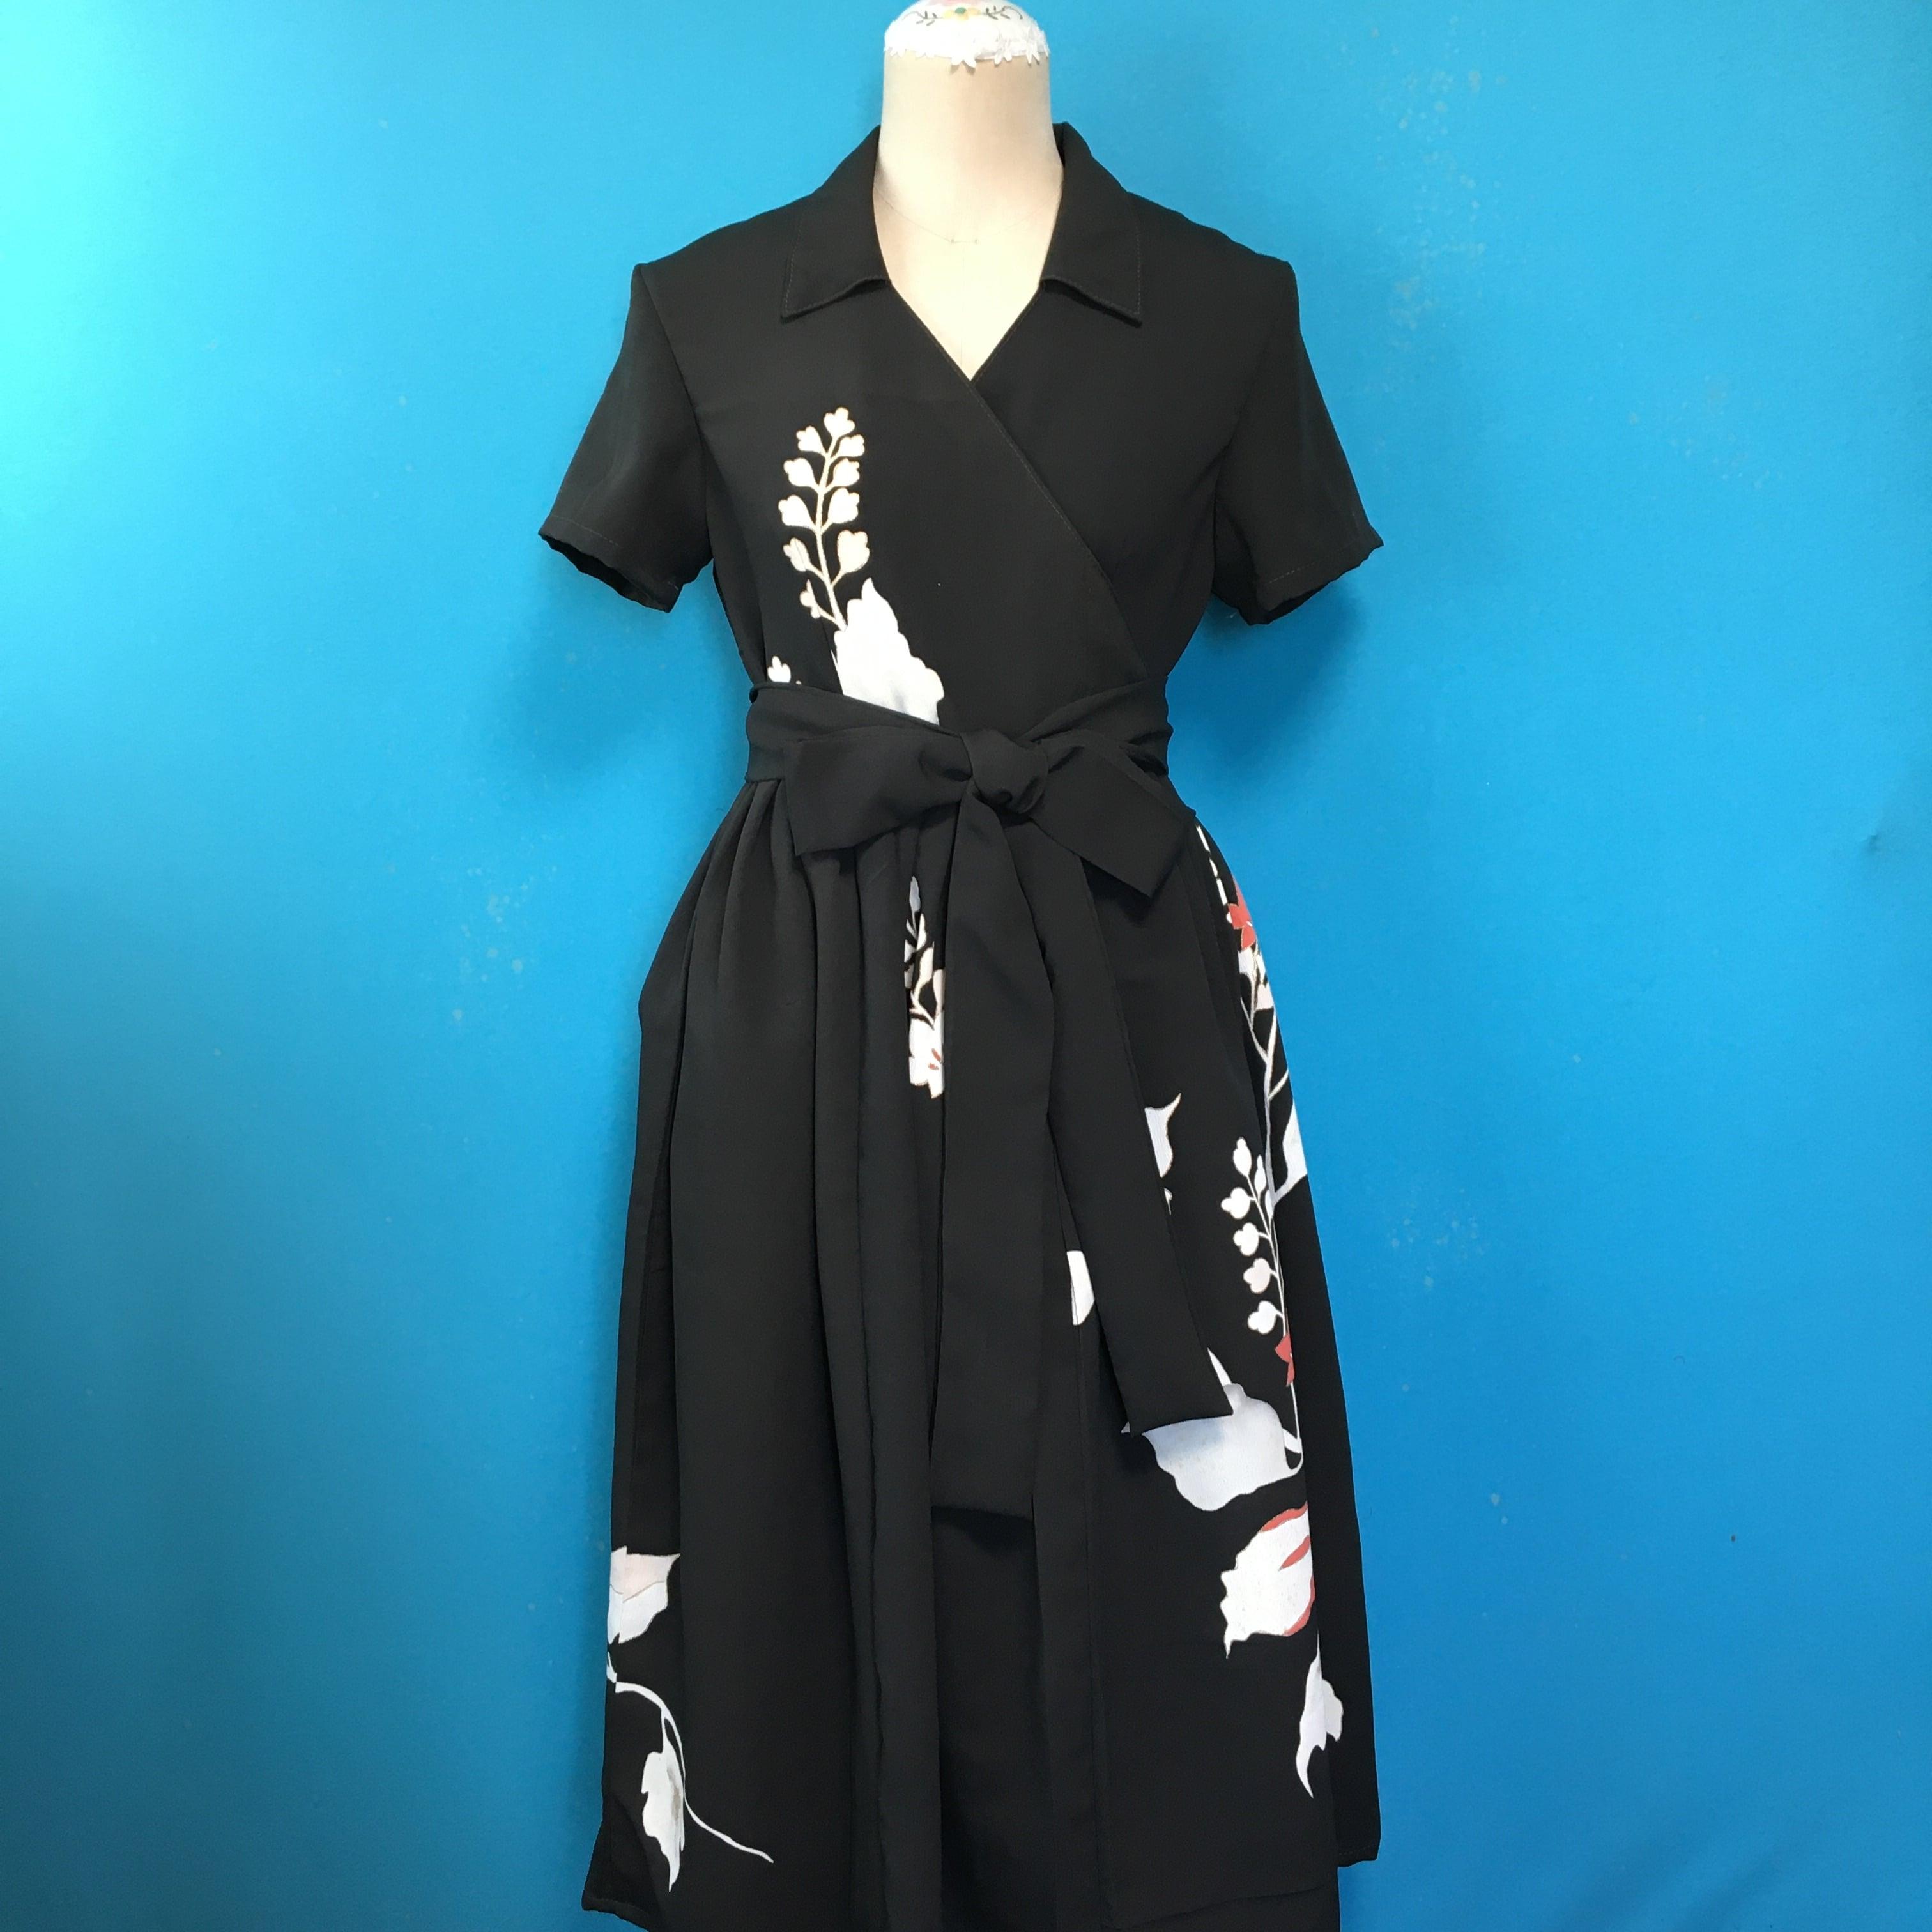 Vintage black dress US 8 訪問着